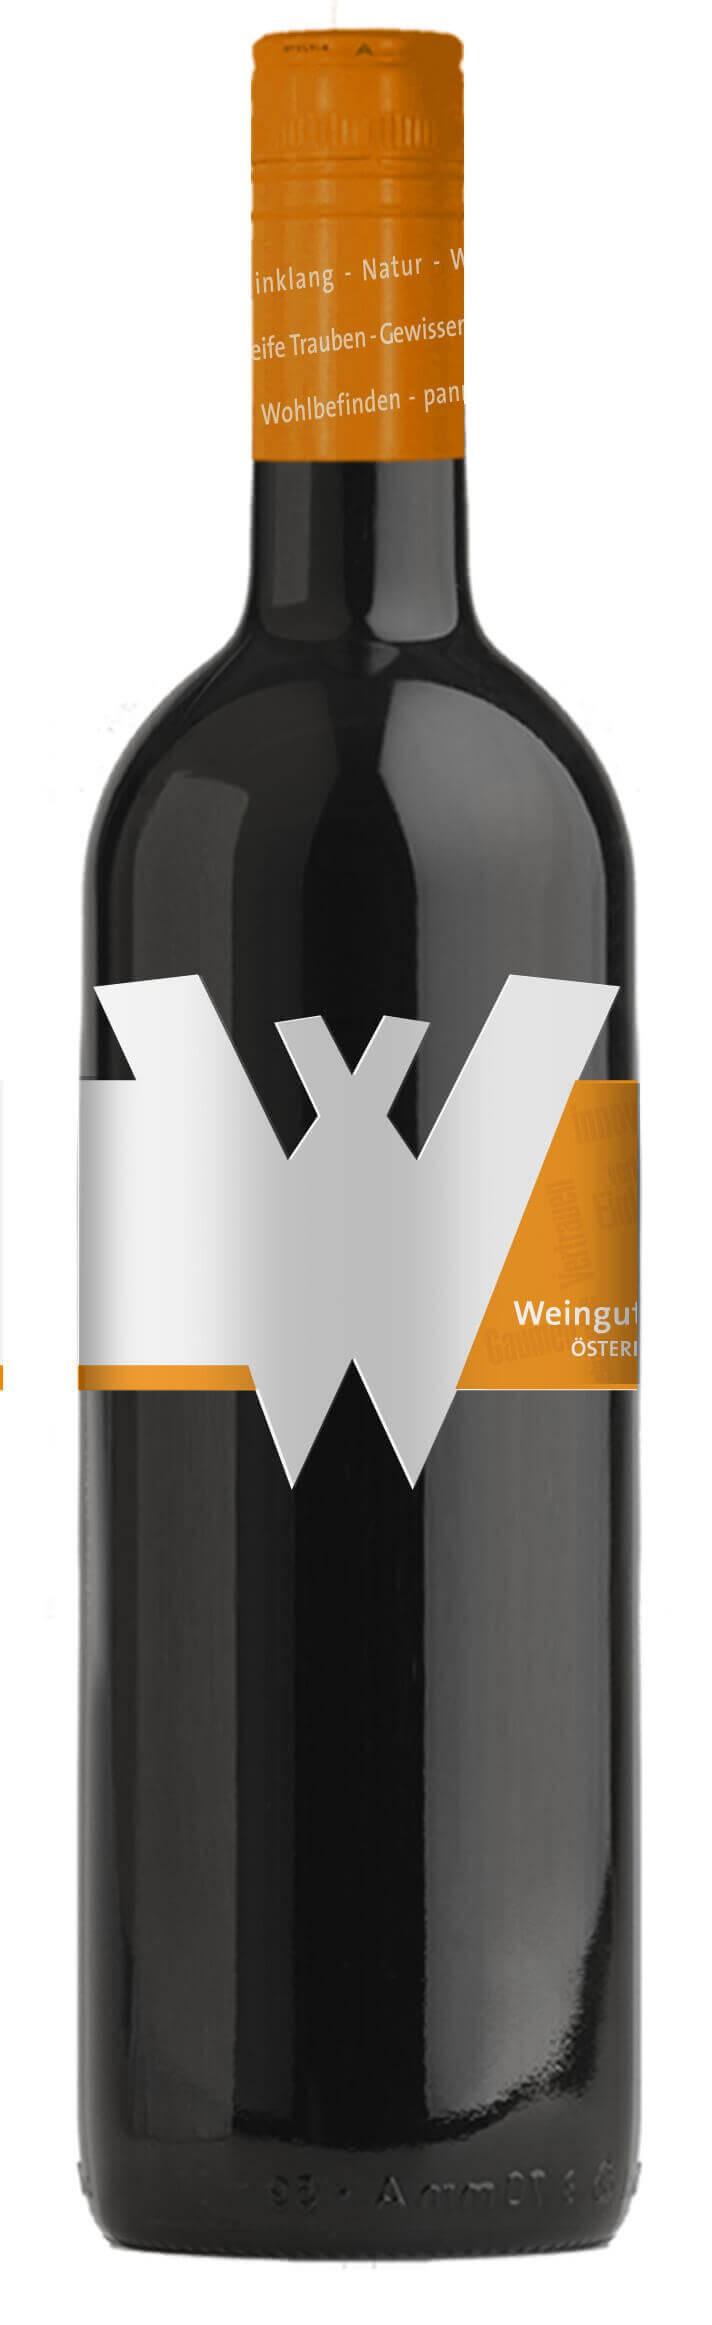 Emanuella víno bez histamínu